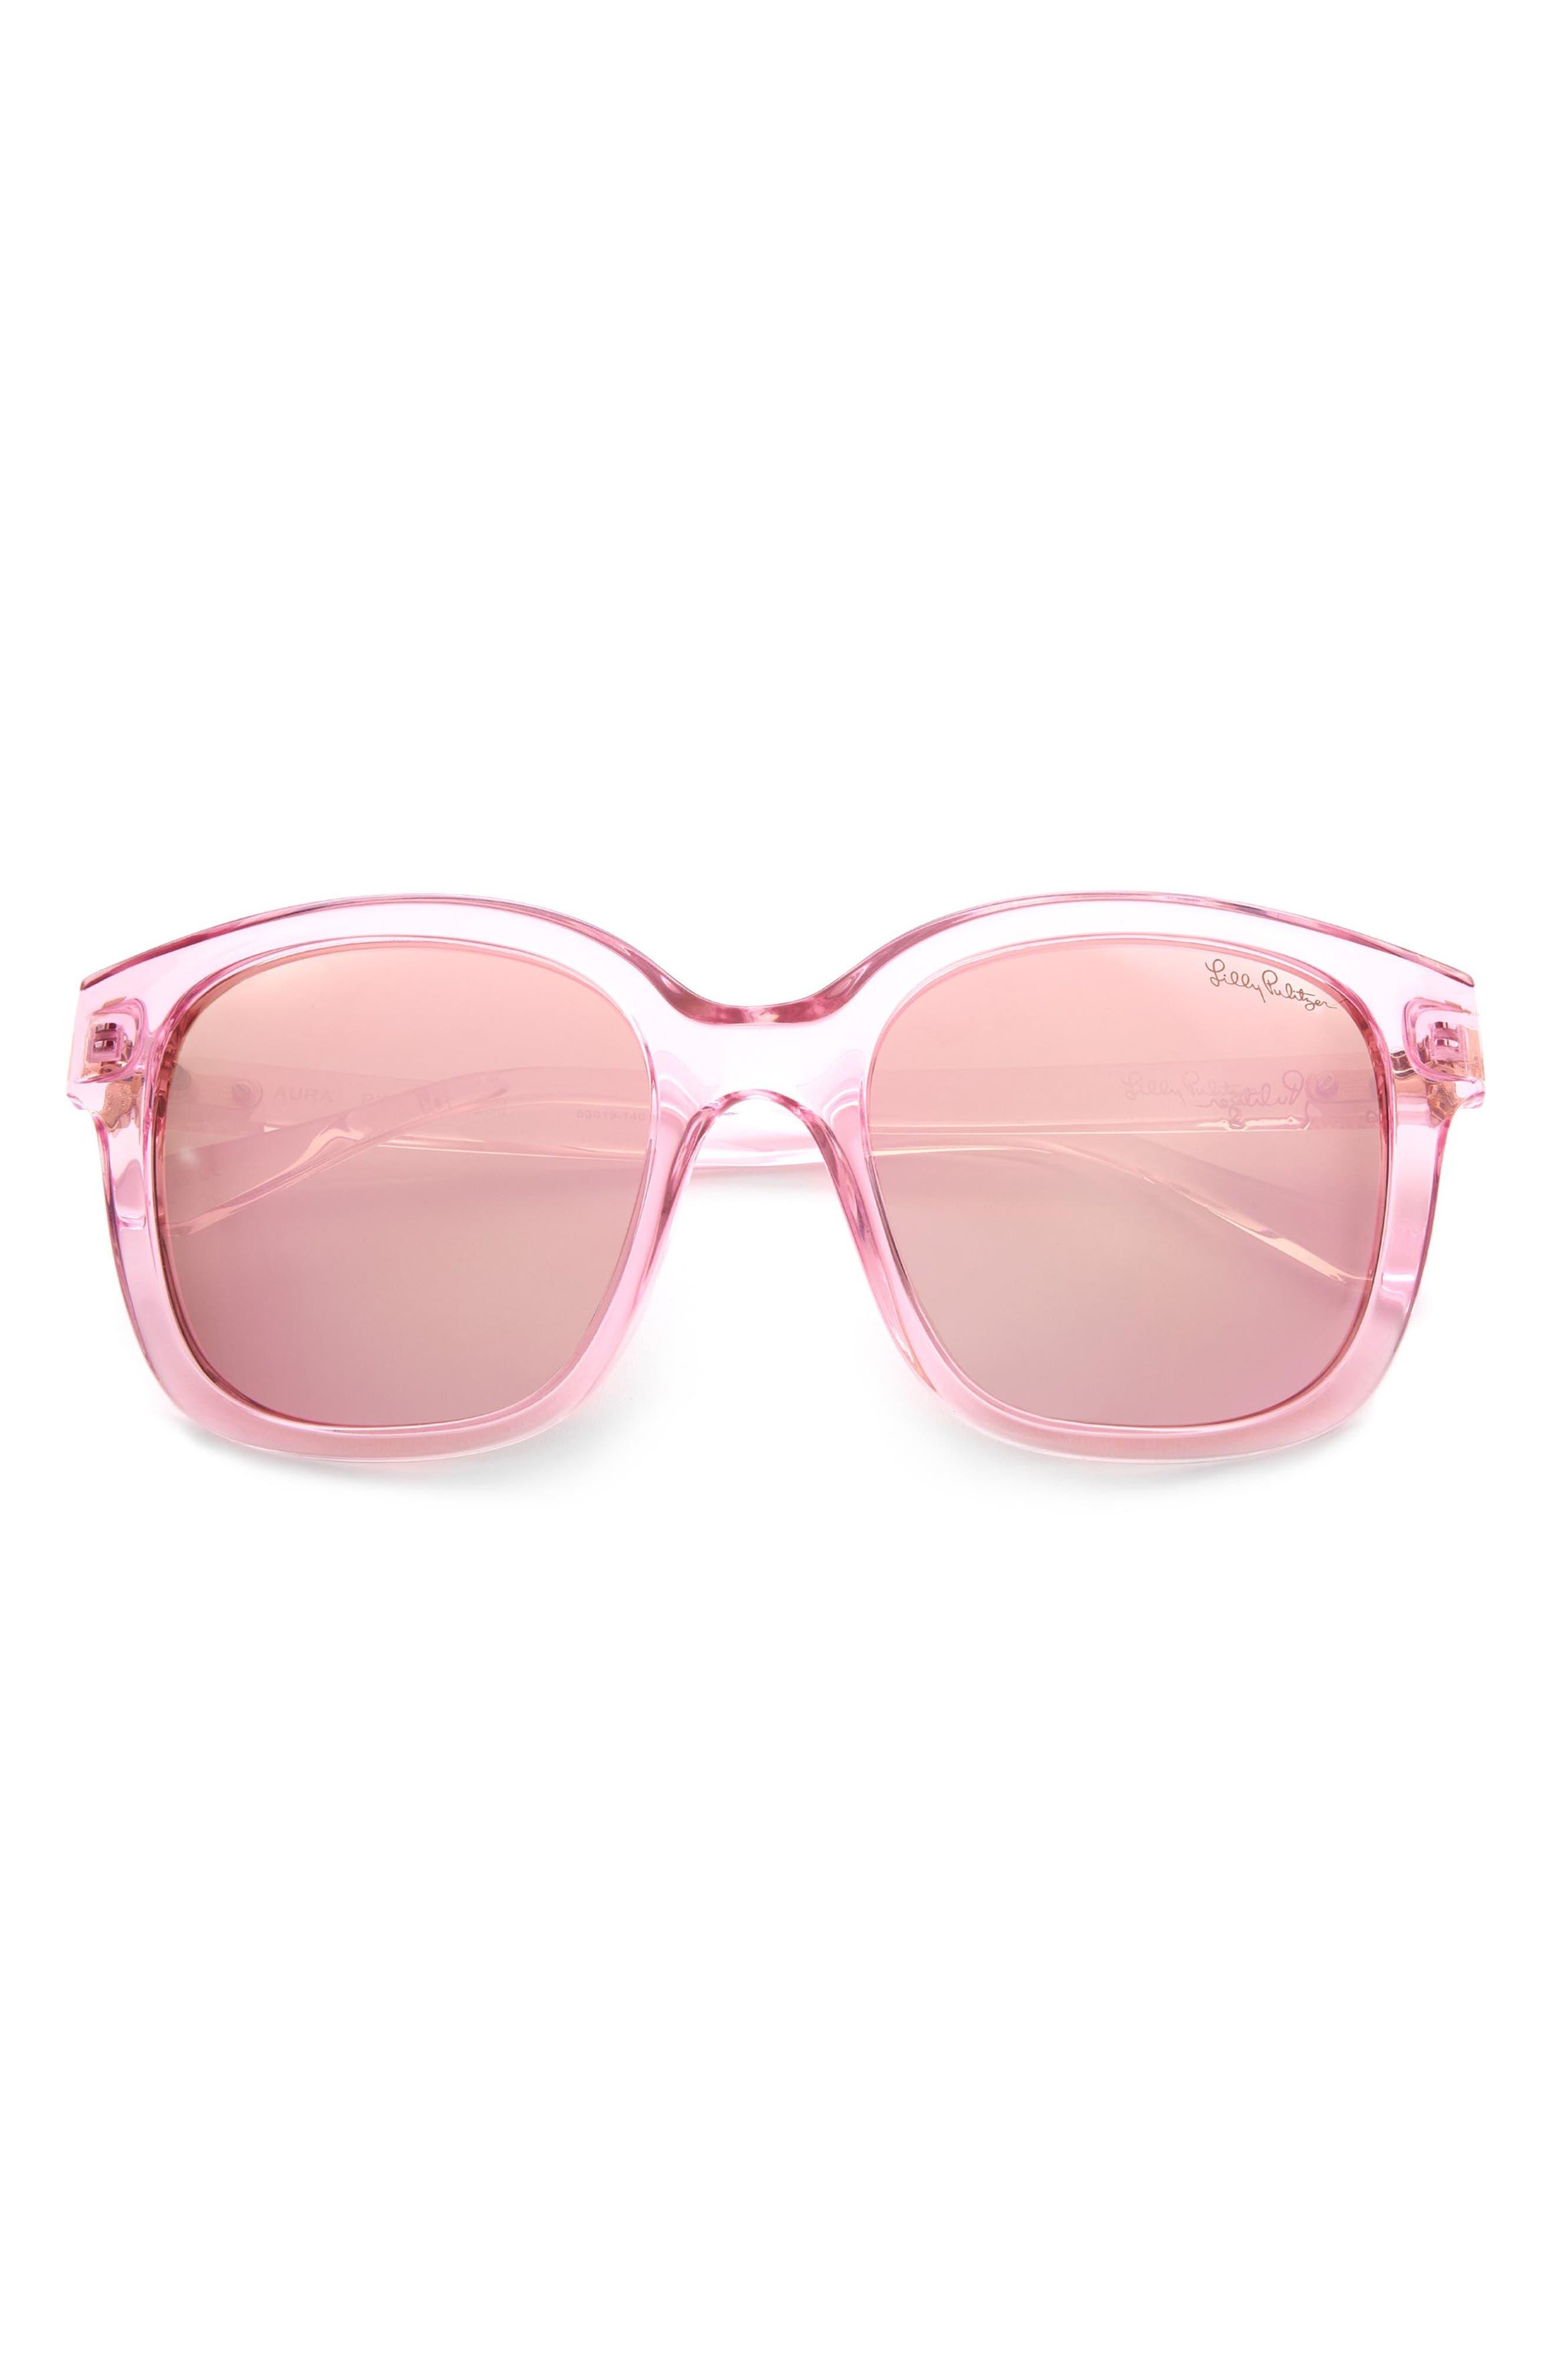 Women's Lilly Pulitzer 53mm Polarized Square Sunglasses